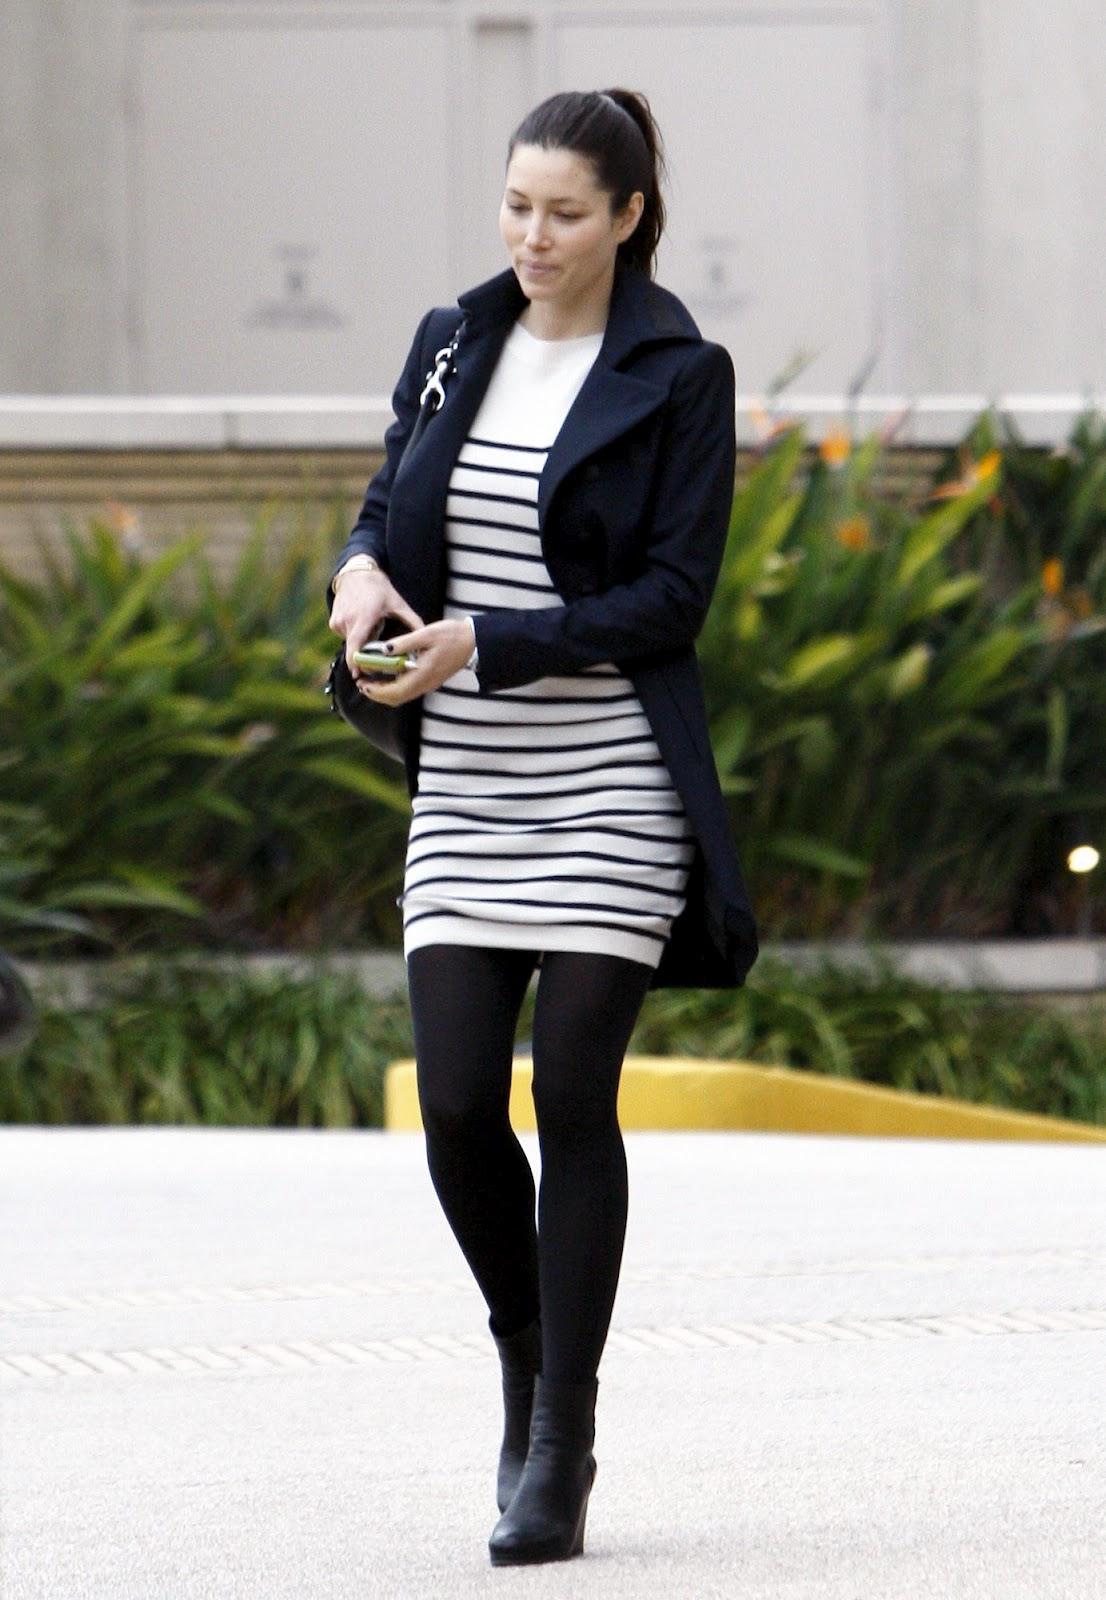 Jessica biel gallery pantyhose